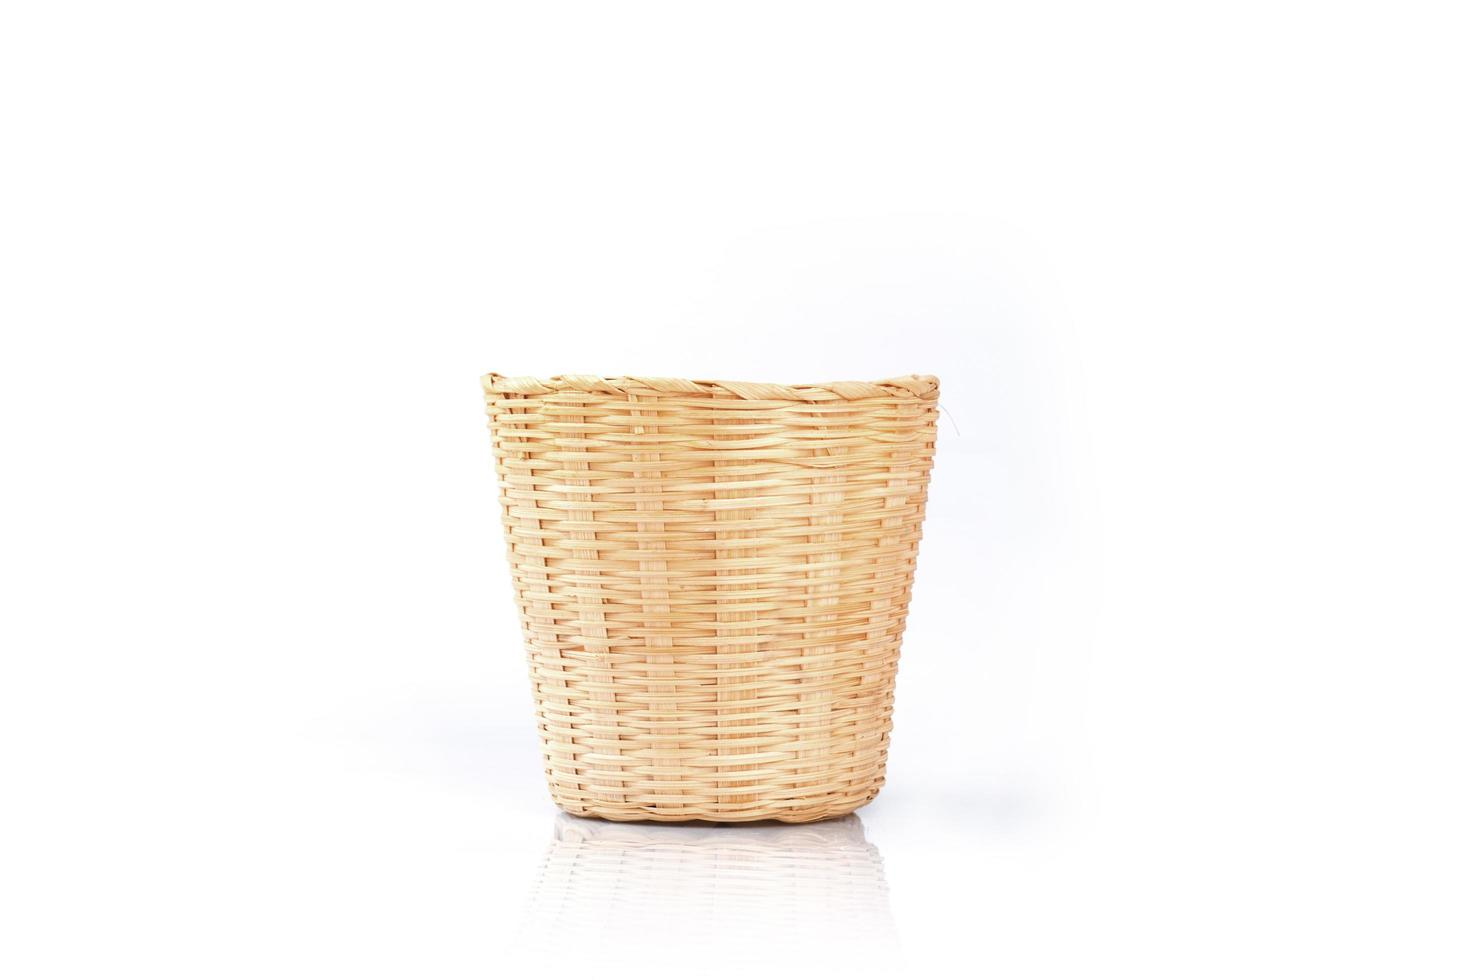 Bamboo basket on a white background photo